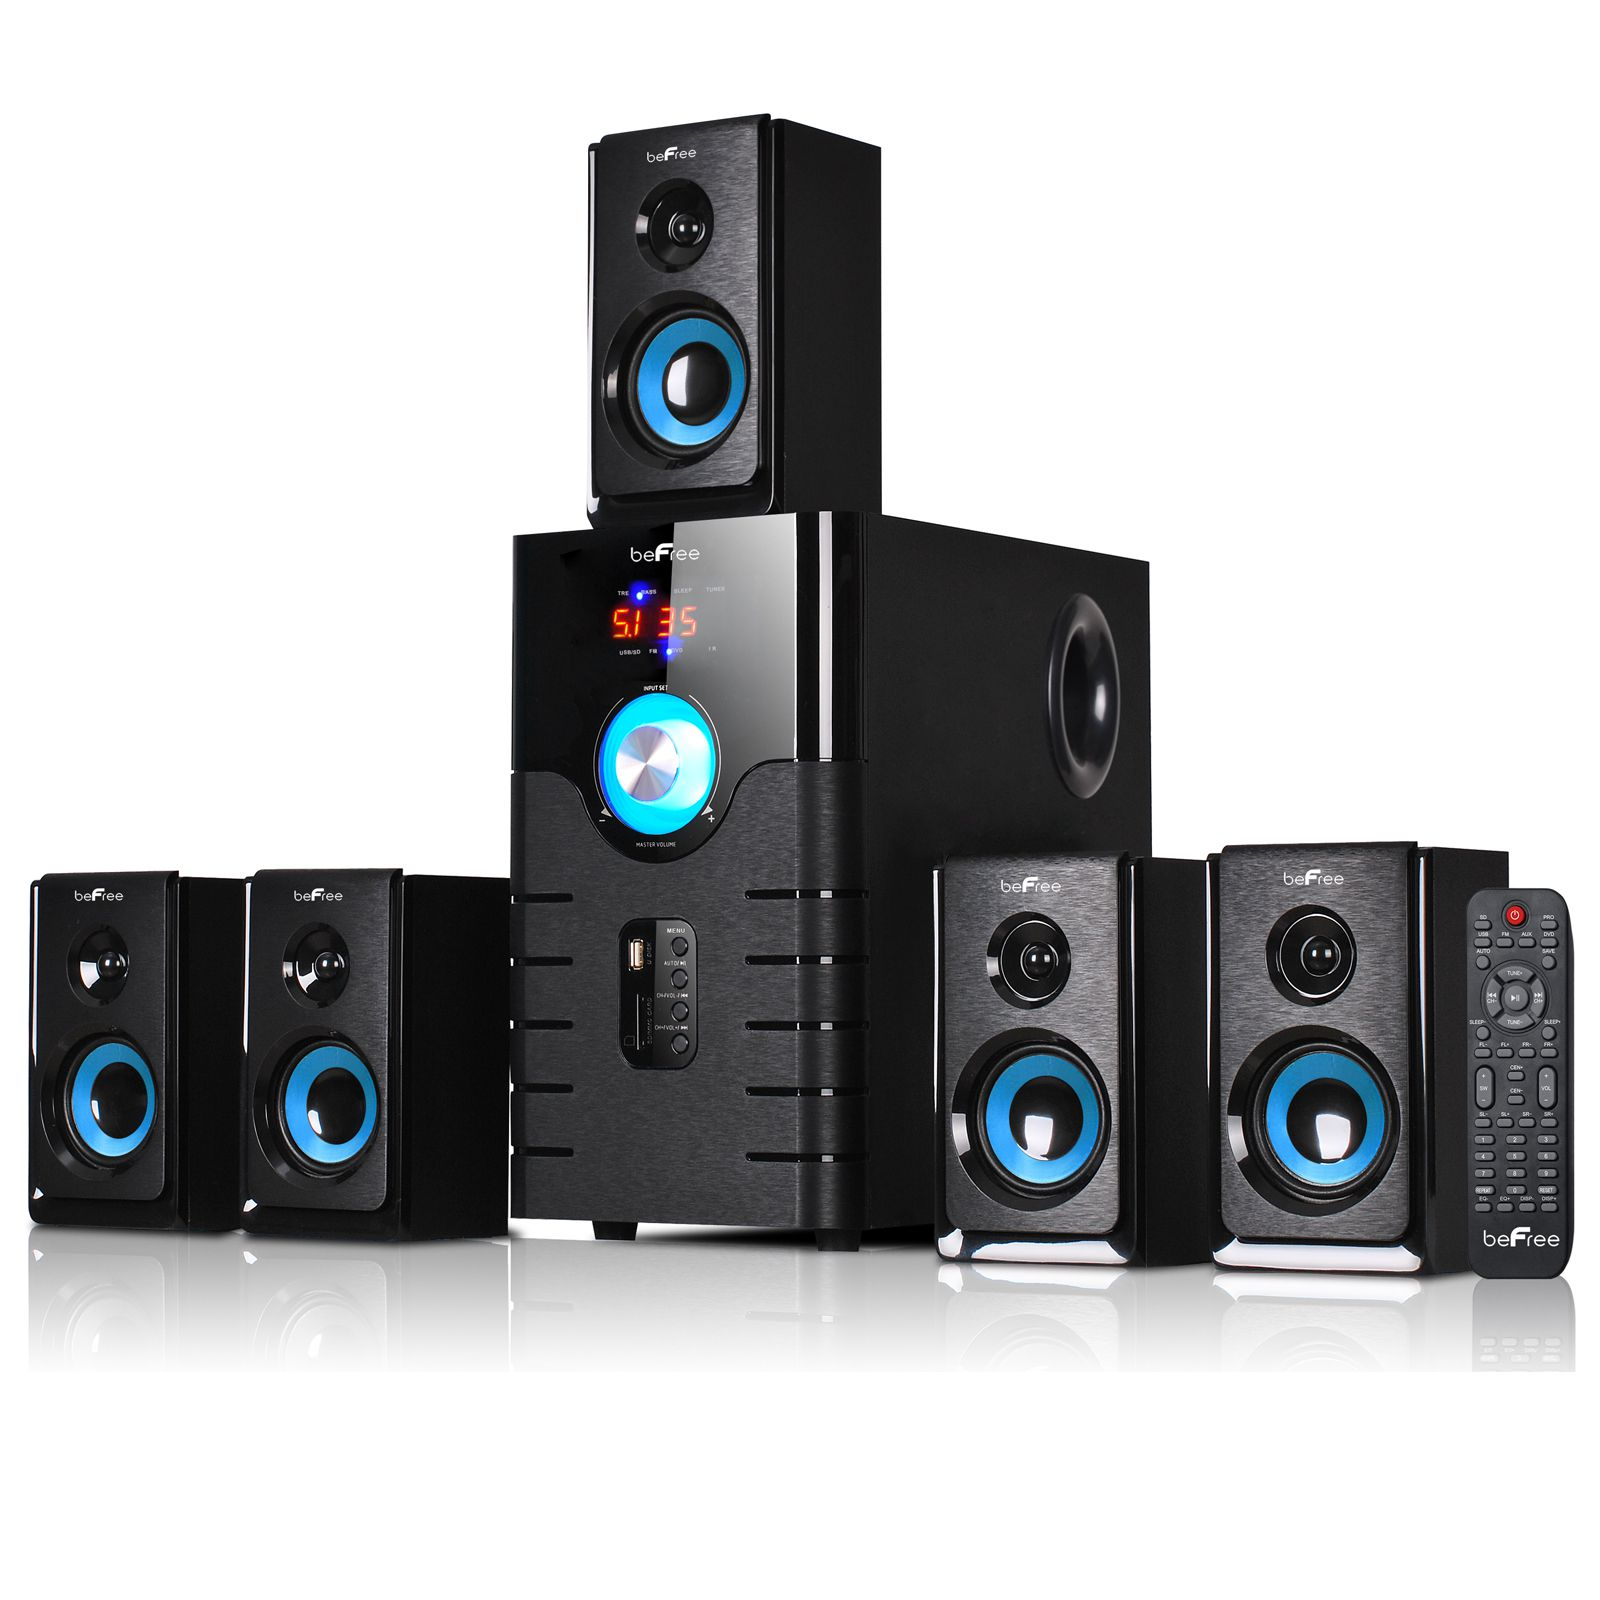 Image Of BeFree Sound 51 Channel Surround Bluetooth Speaker System